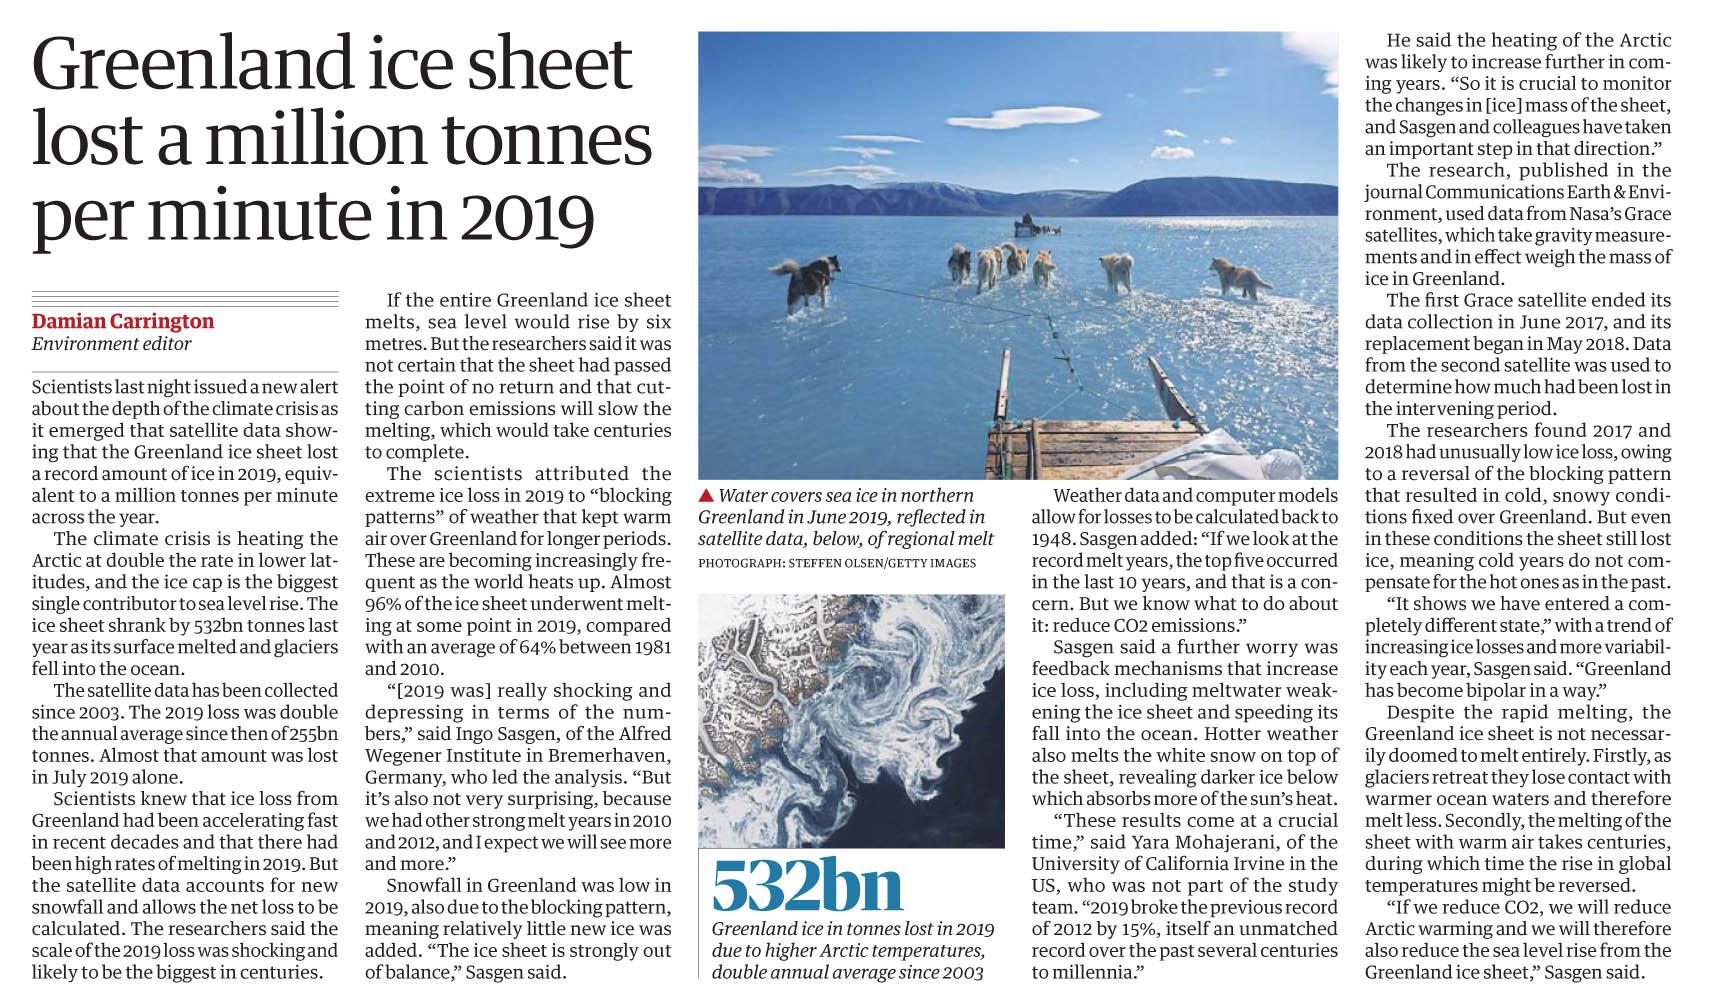 Guardian 200821 Greenland ice.jpg